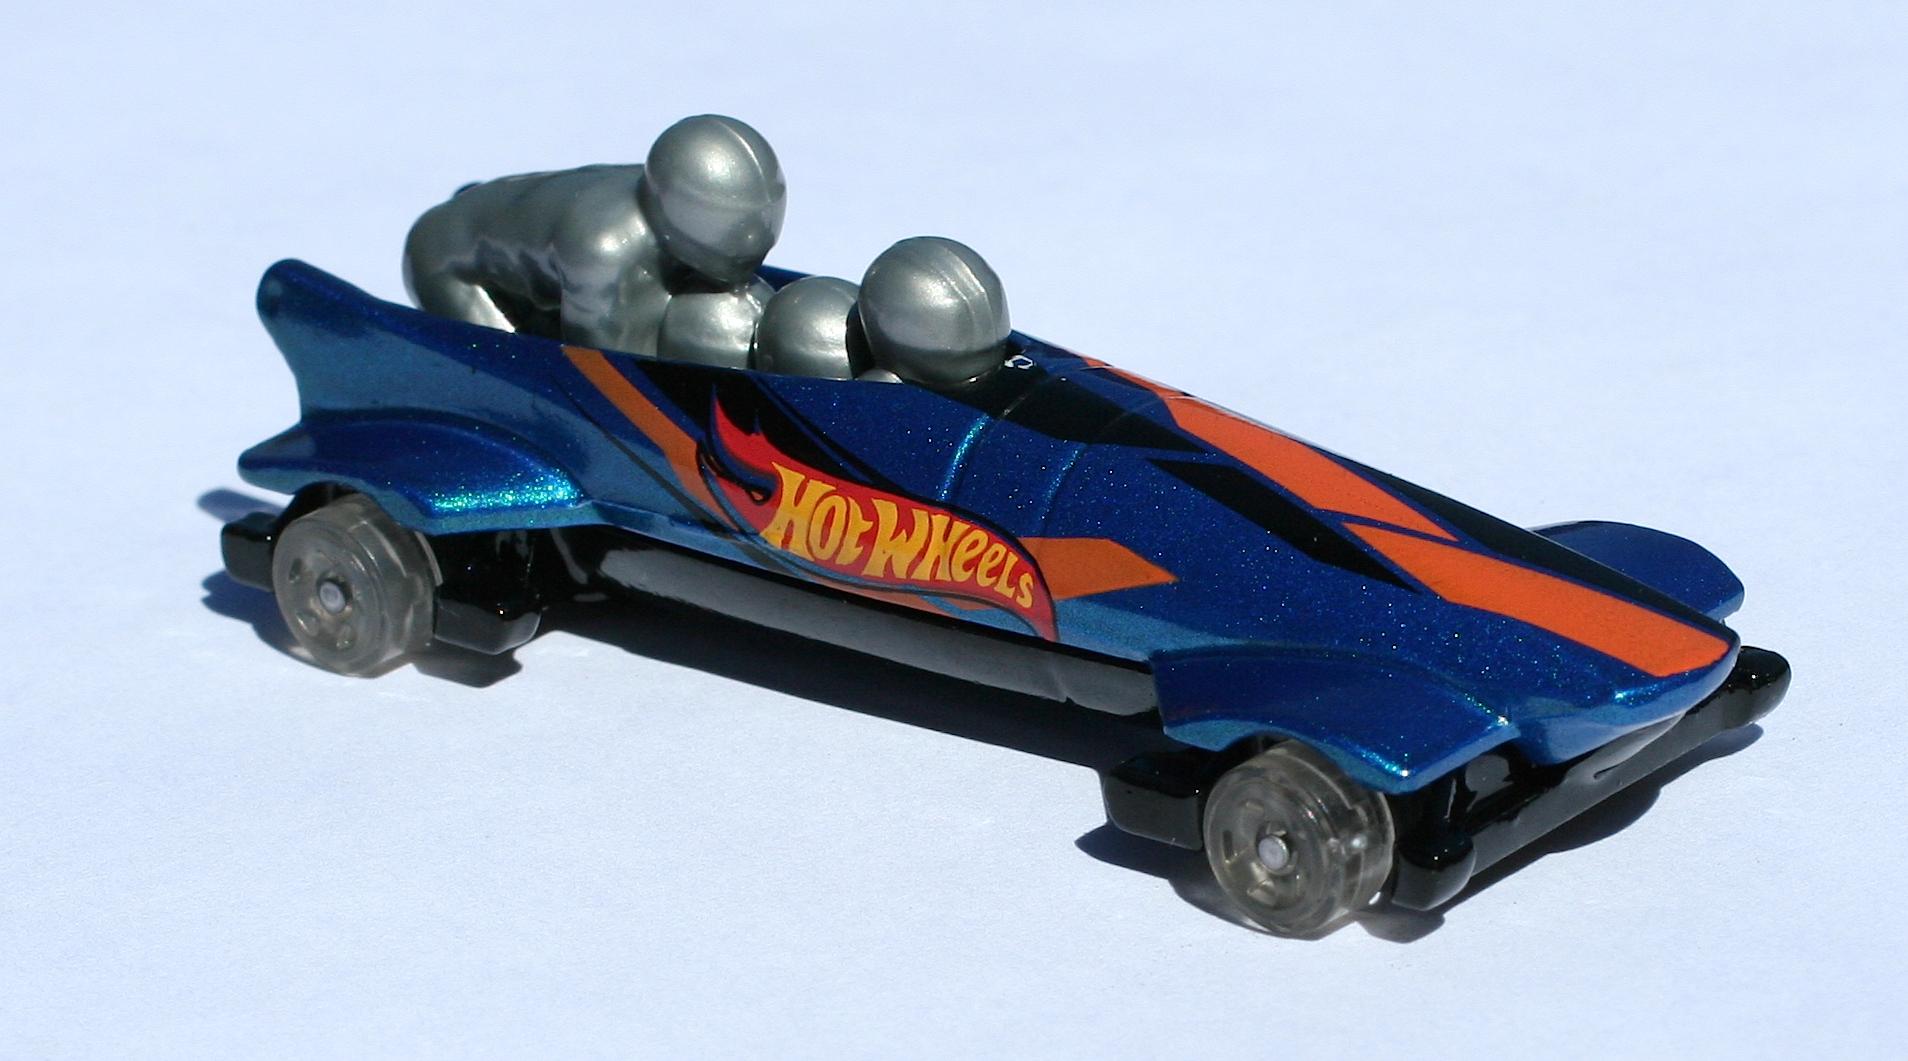 Ice shredder hot wheels wiki